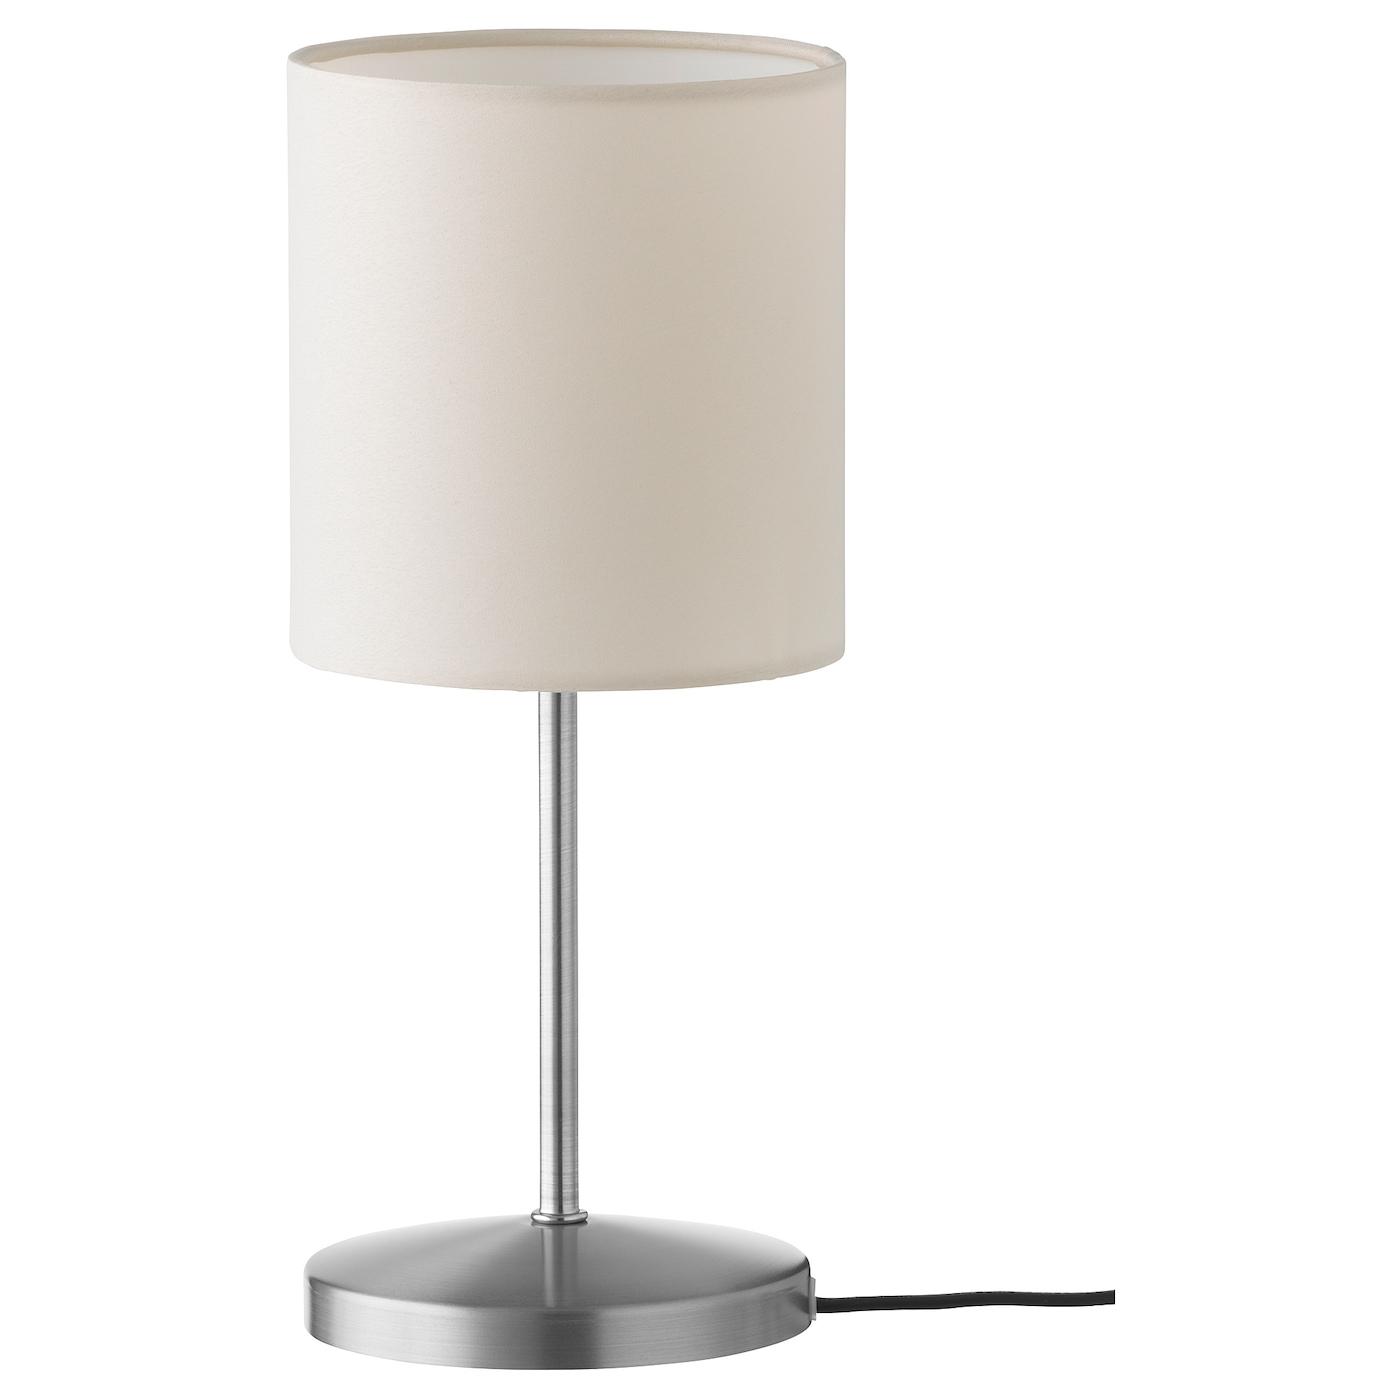 Lámparas de Mesa | Iluminación | Compra Online IKEA - photo#30